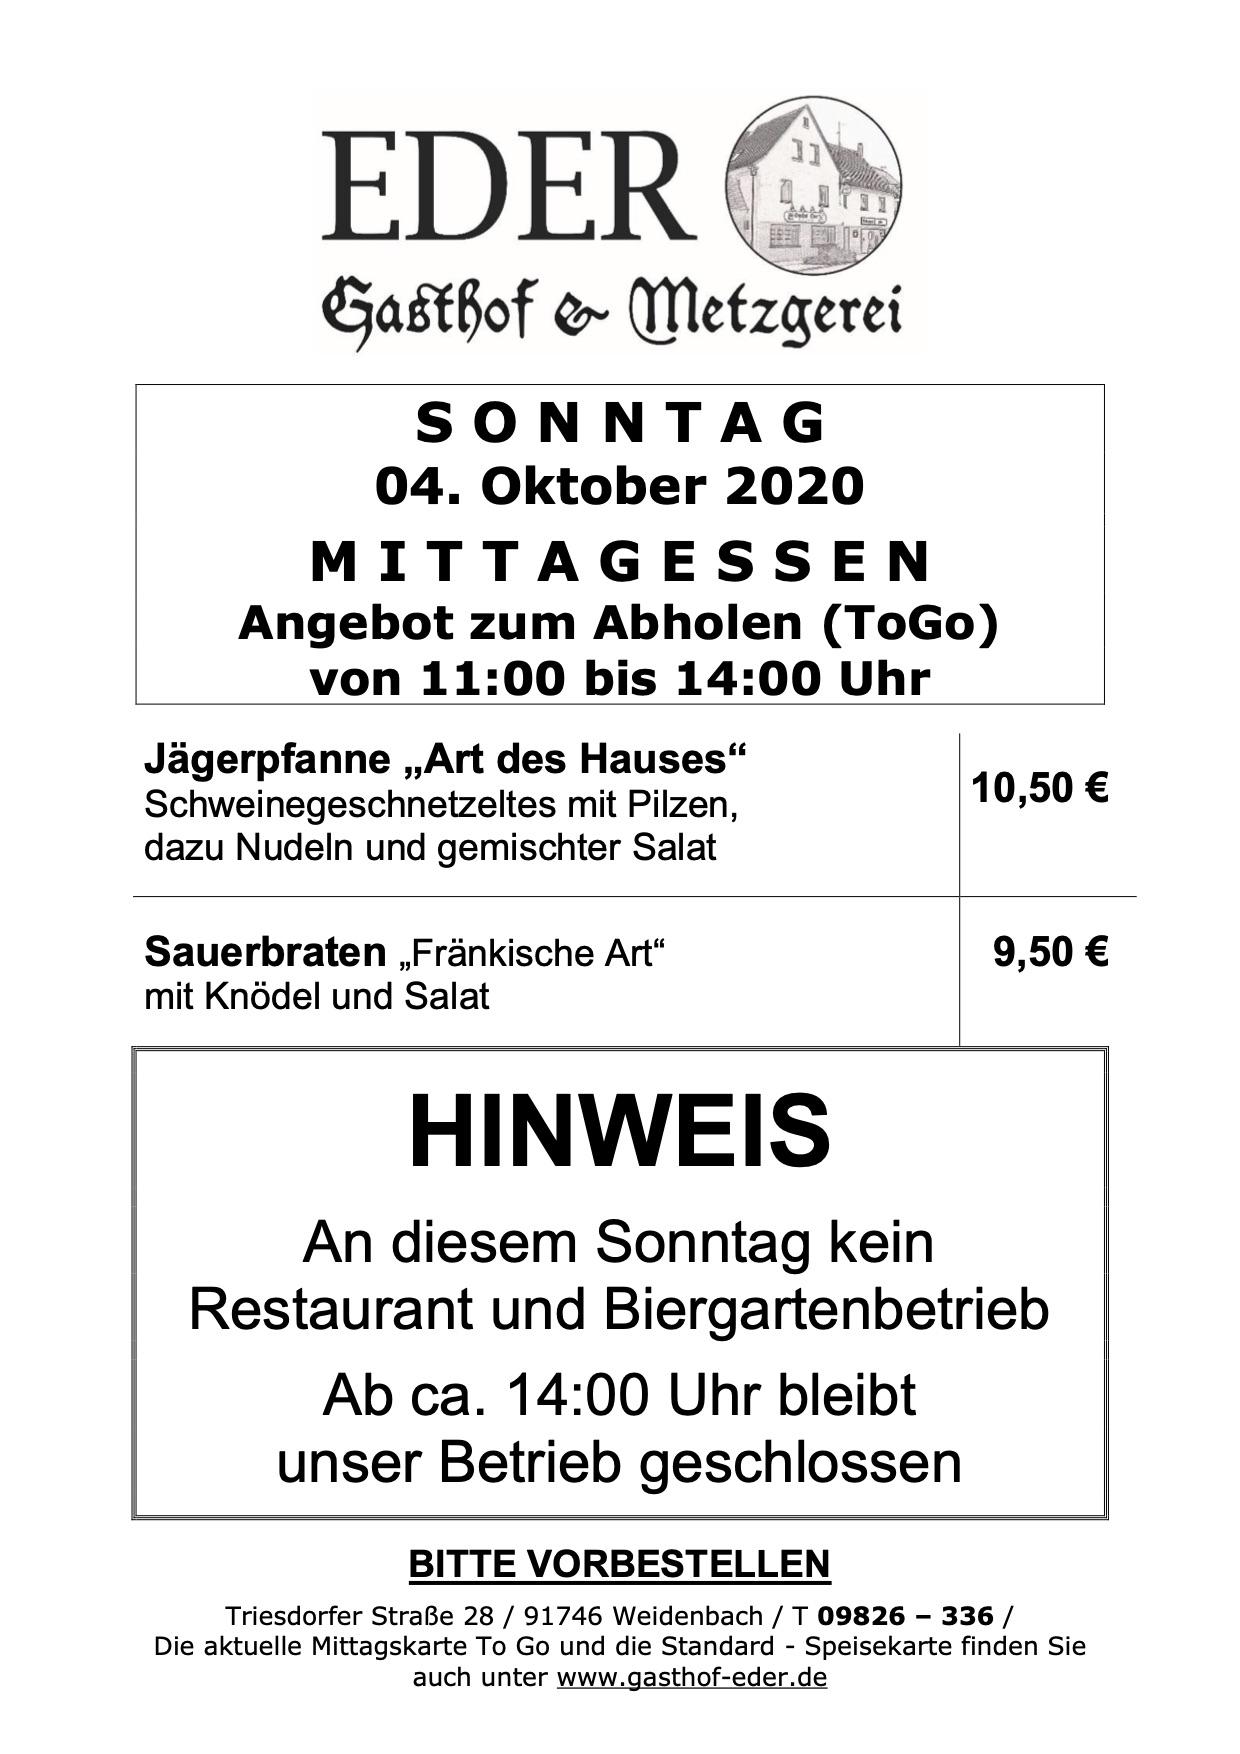 Sonntag_04.10.2020